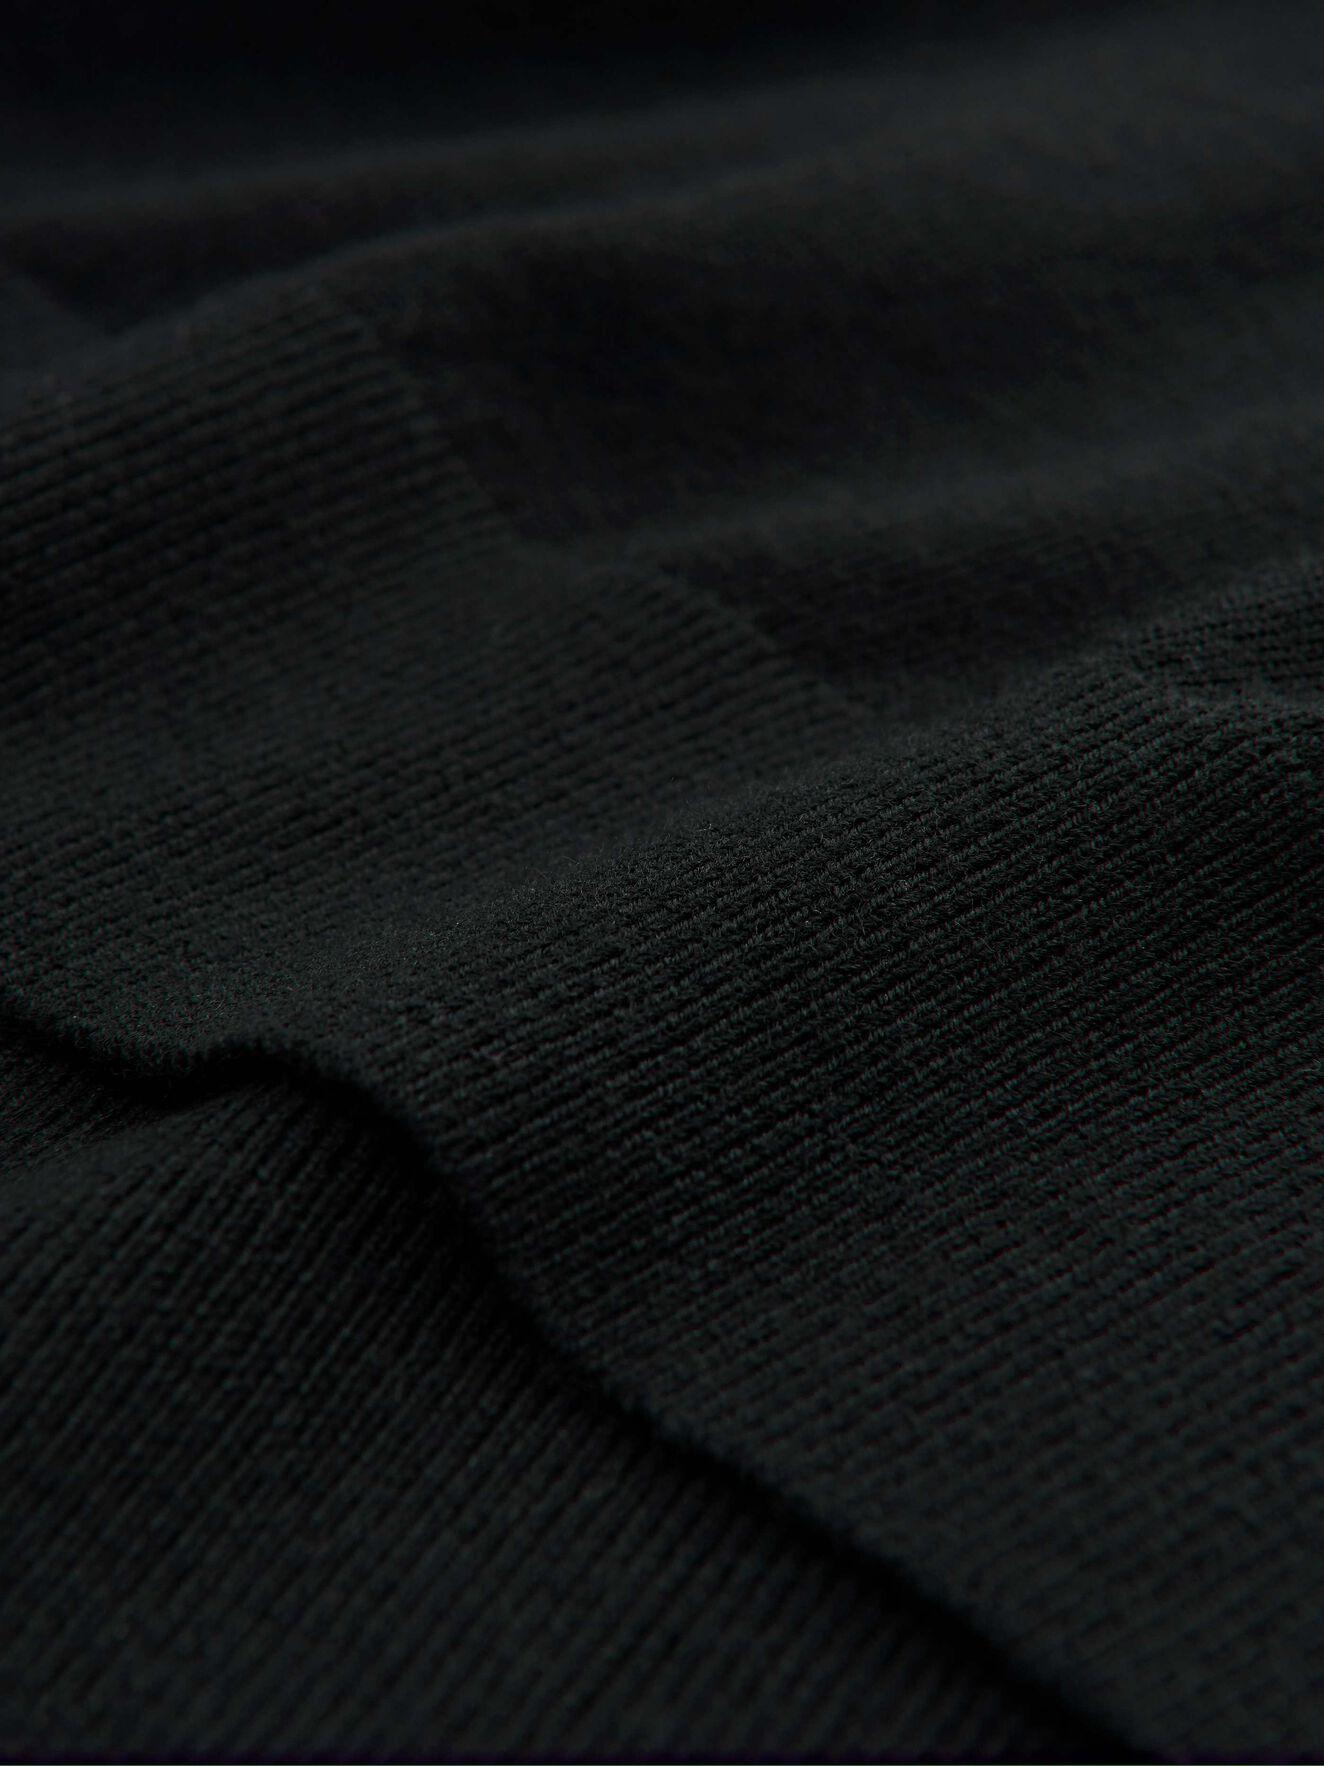 Nevile Pullover in Black from Tiger of Sweden